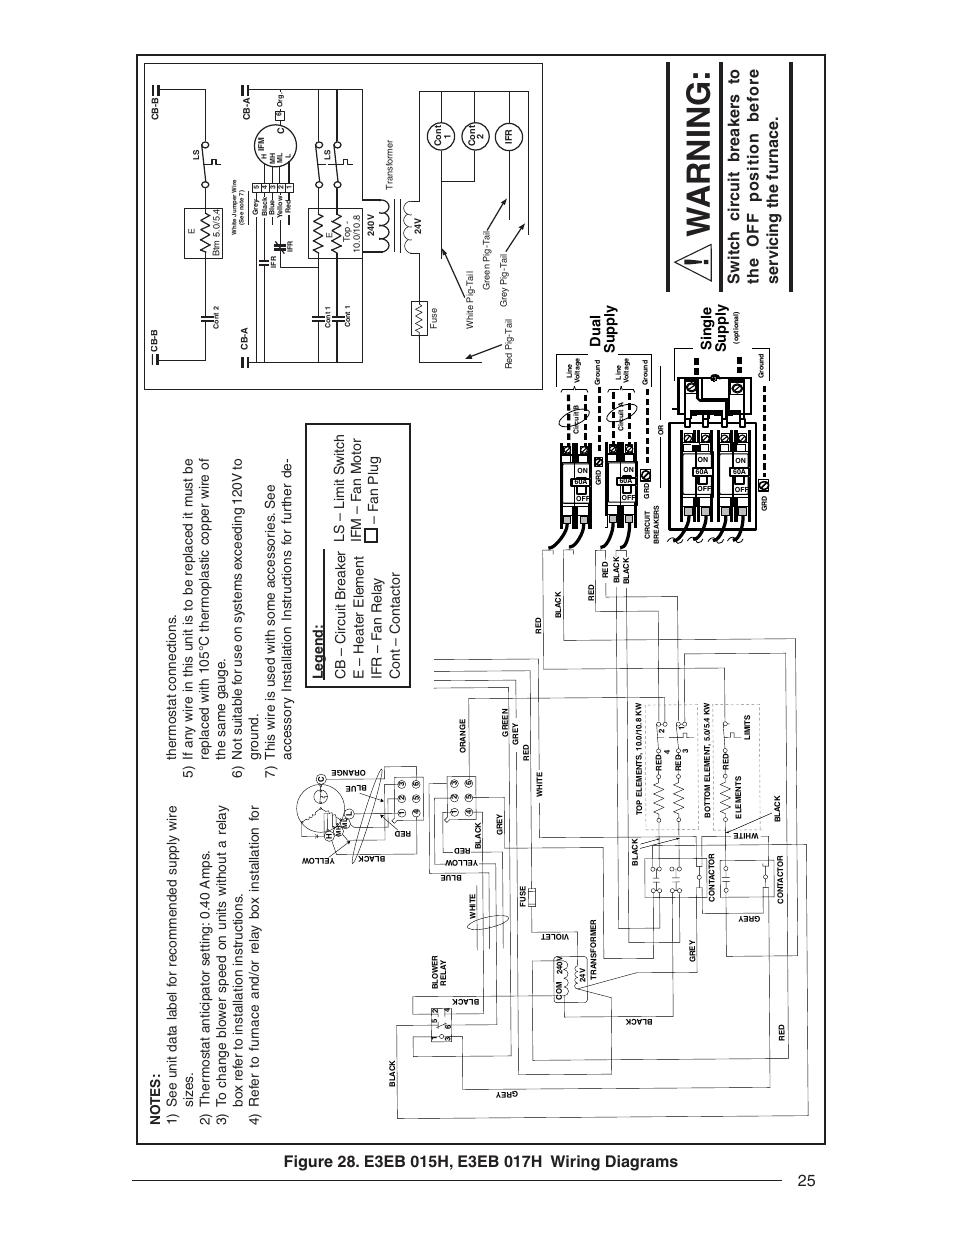 intertherm electric furnace wiring diagram 1 way switch uk warning, single suppl y, dual y | nordyne e3 series user manual page 25 / 32